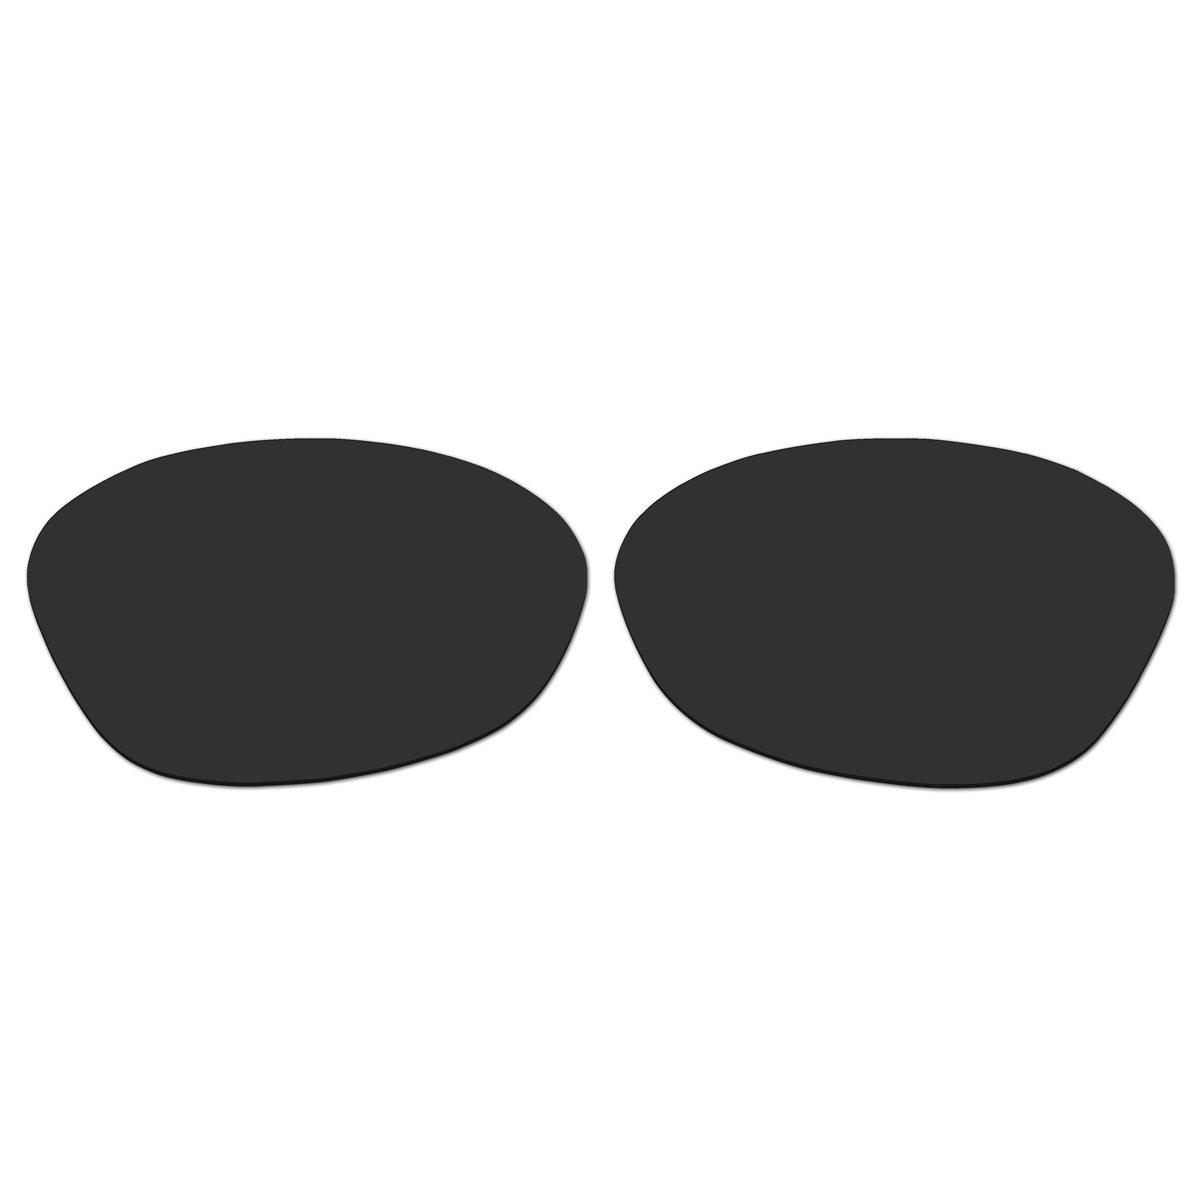 2bb45f5f88369 Amazon.com   ACOMPATIBLE Replacement Black Polarized Lenses Oakley Valve  Sunglasses   Sports   Outdoors